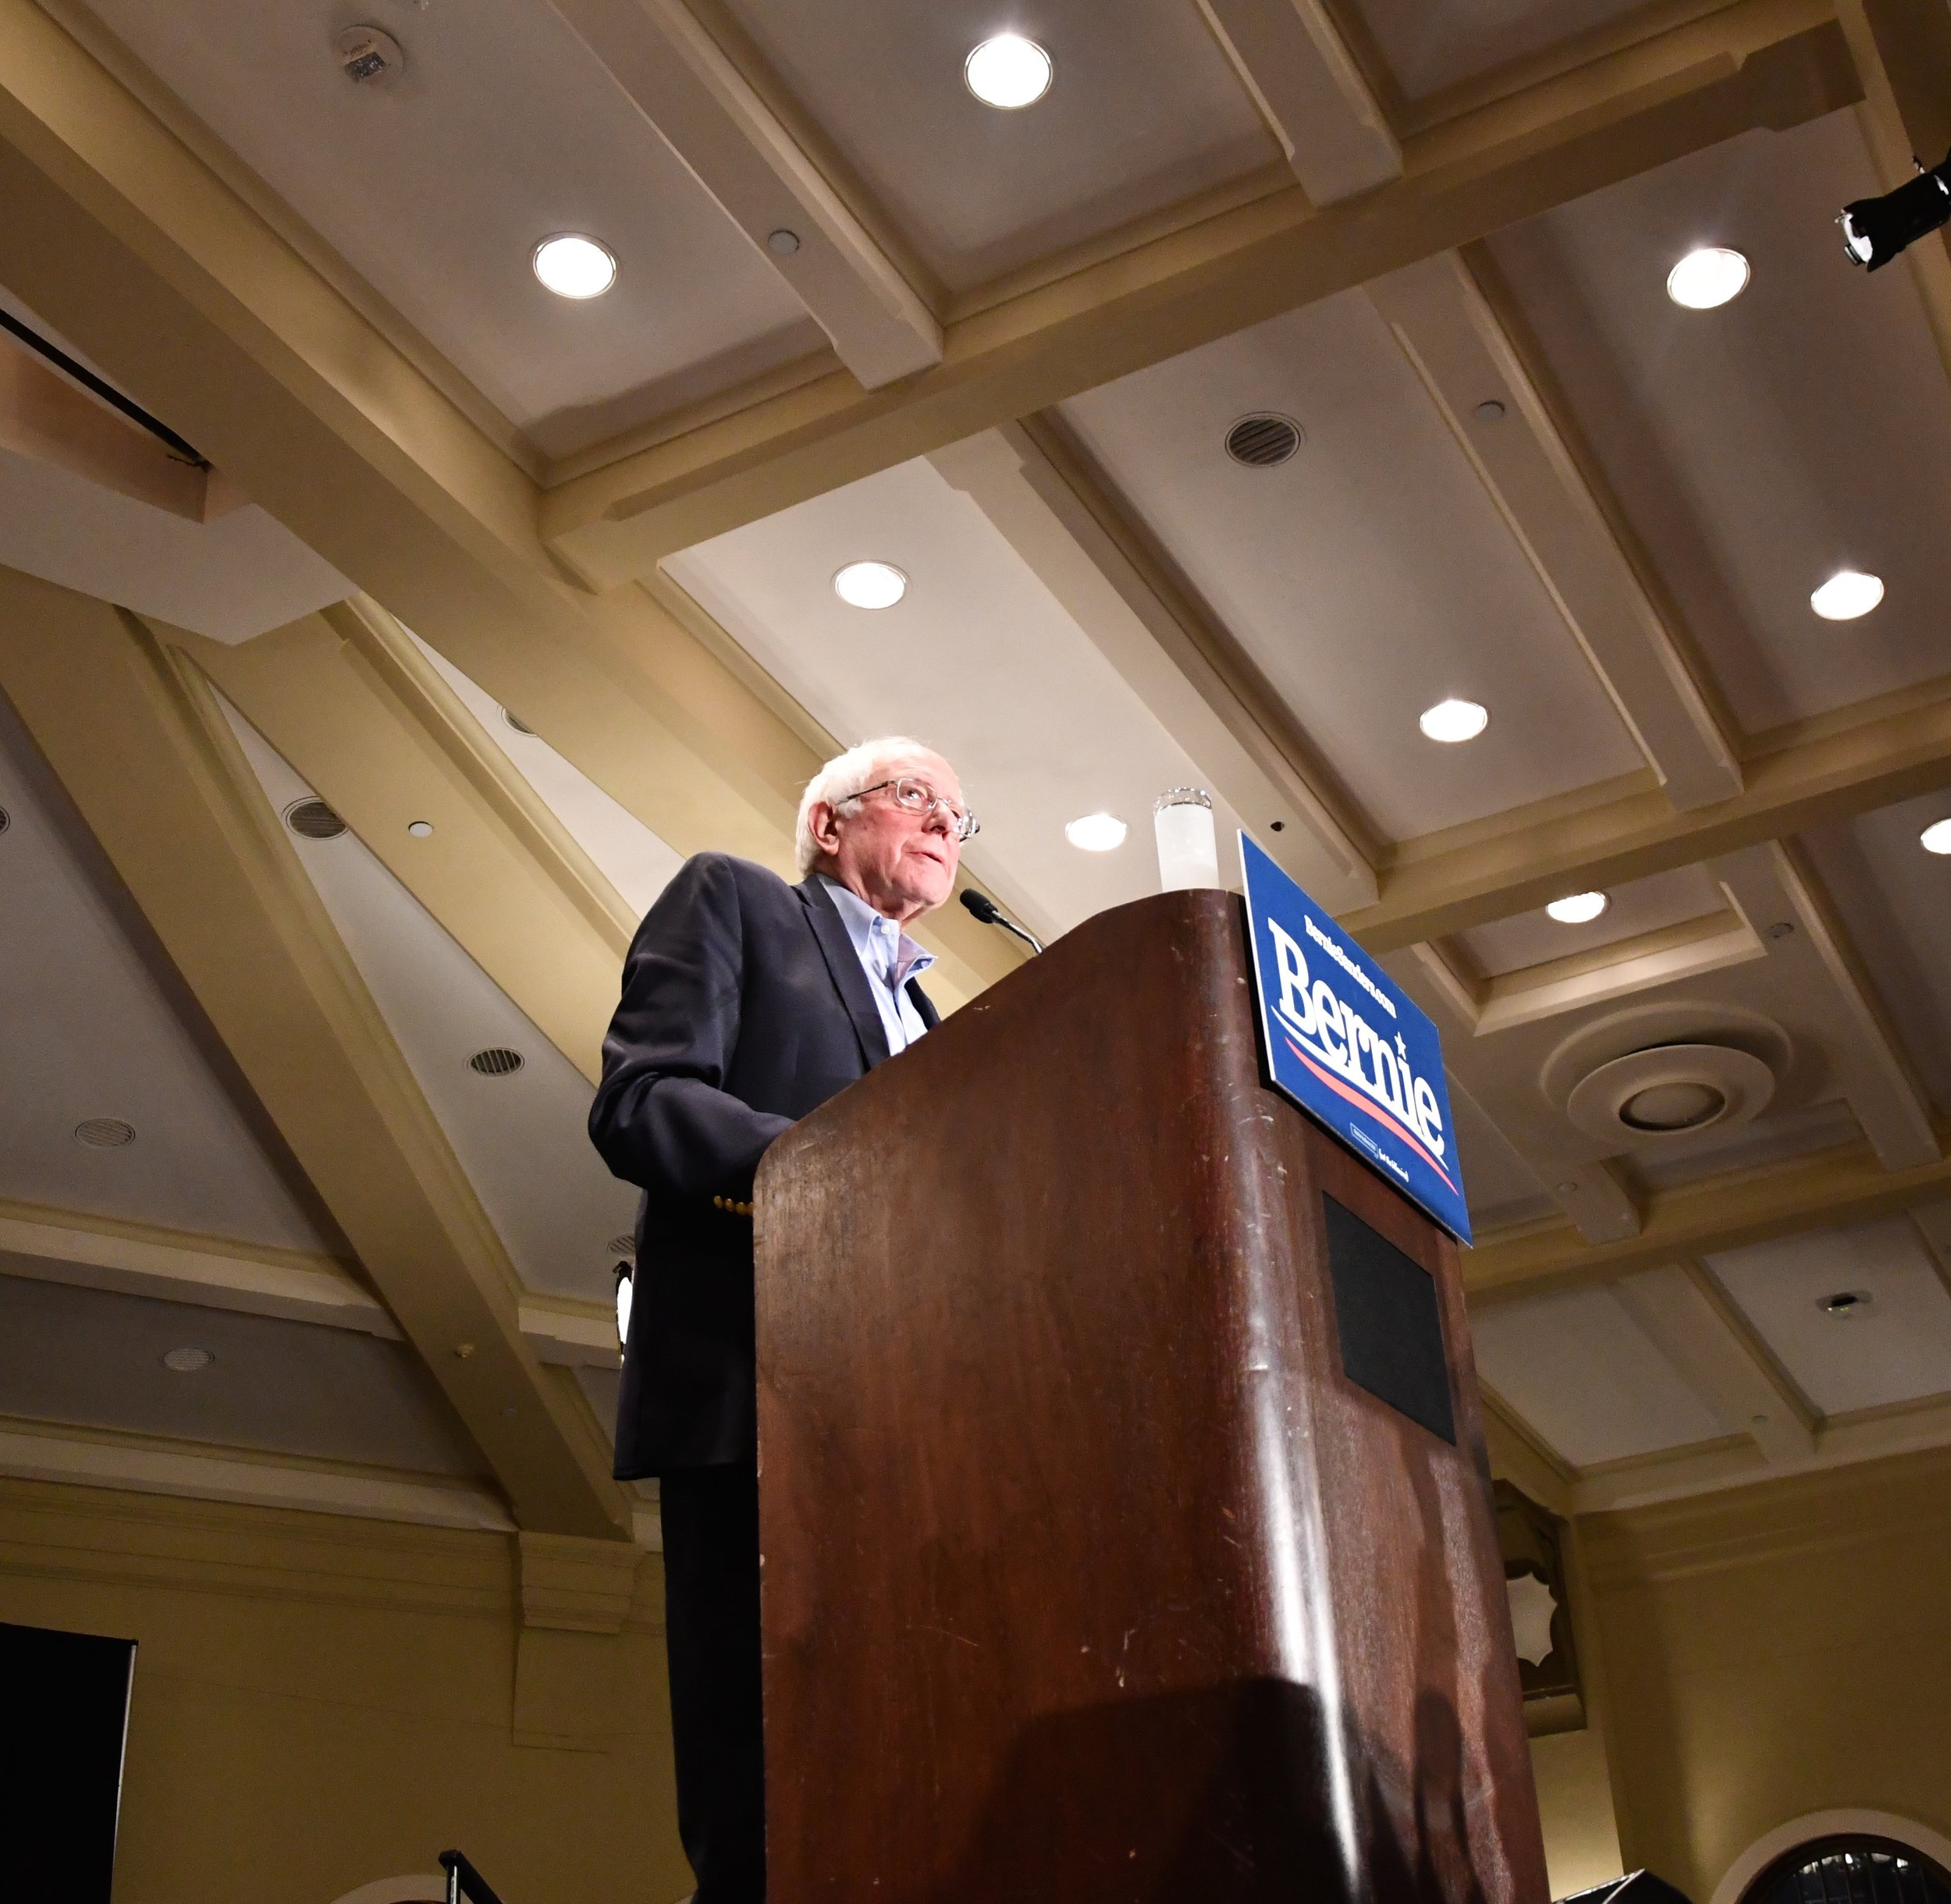 Senator Bernie Sanders at the podium, delivering his speech.  Photo by Olivia Harter